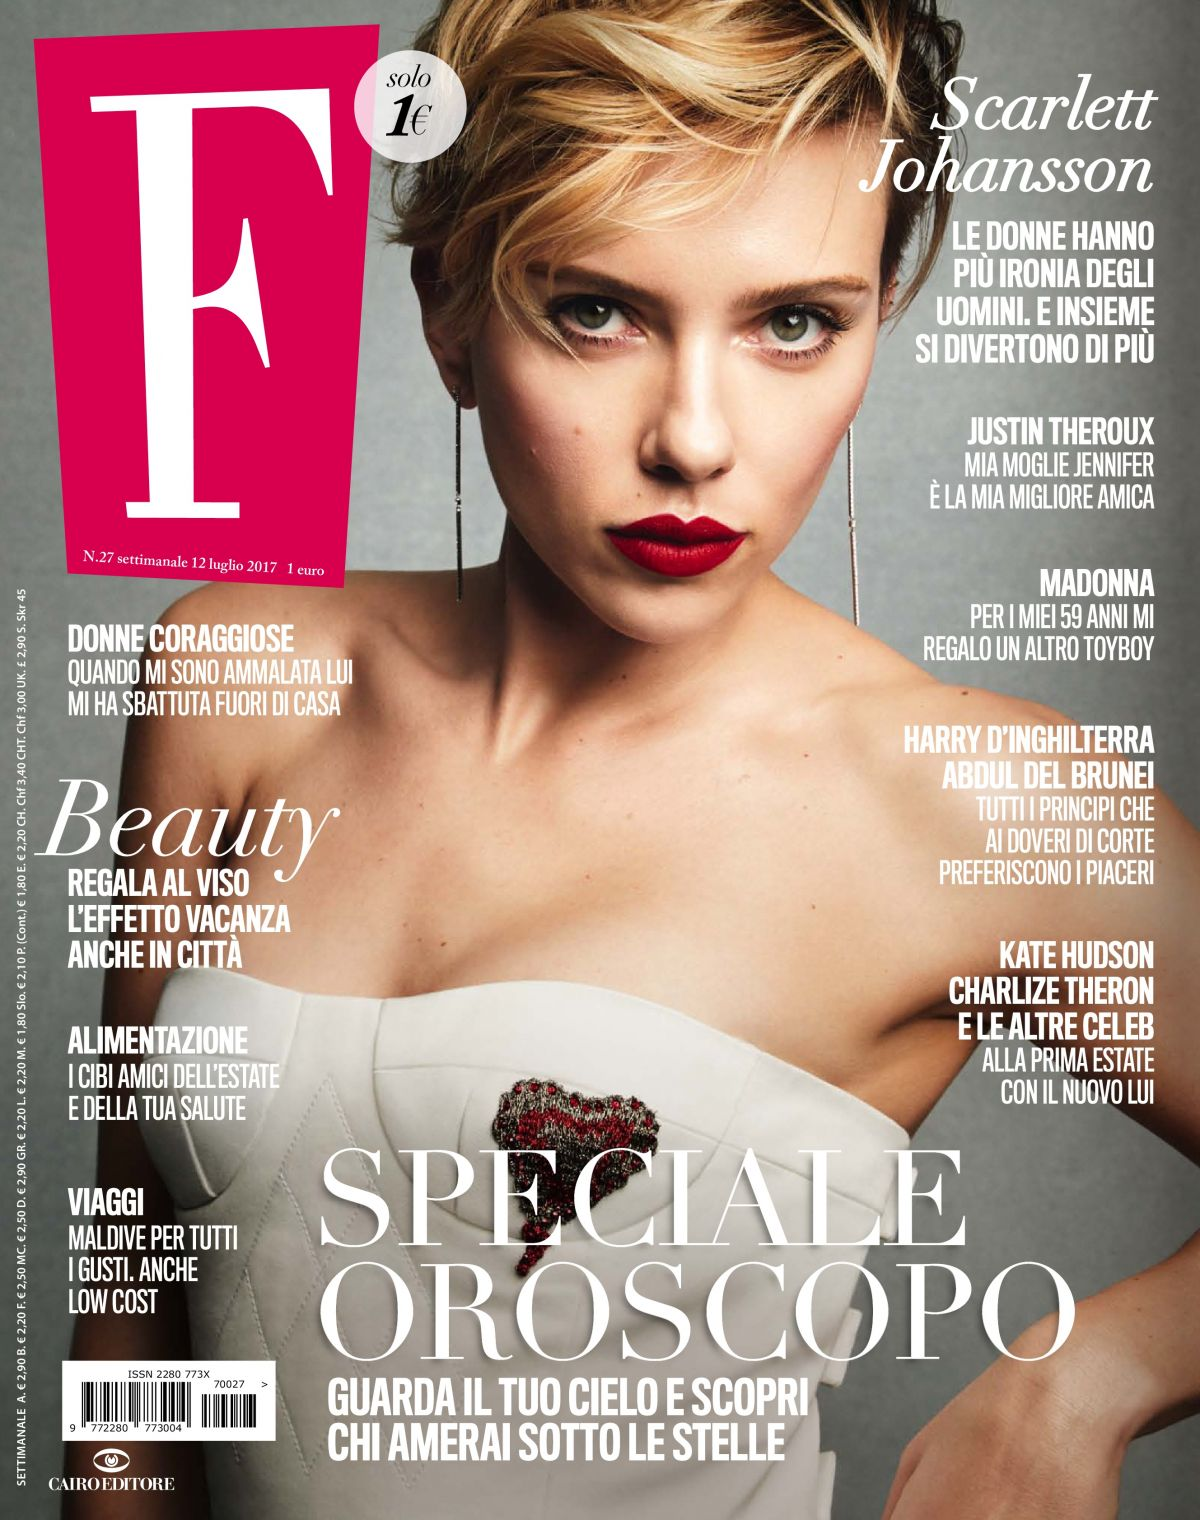 SCARLETT JOHANSSON in F Magazine, July 2017